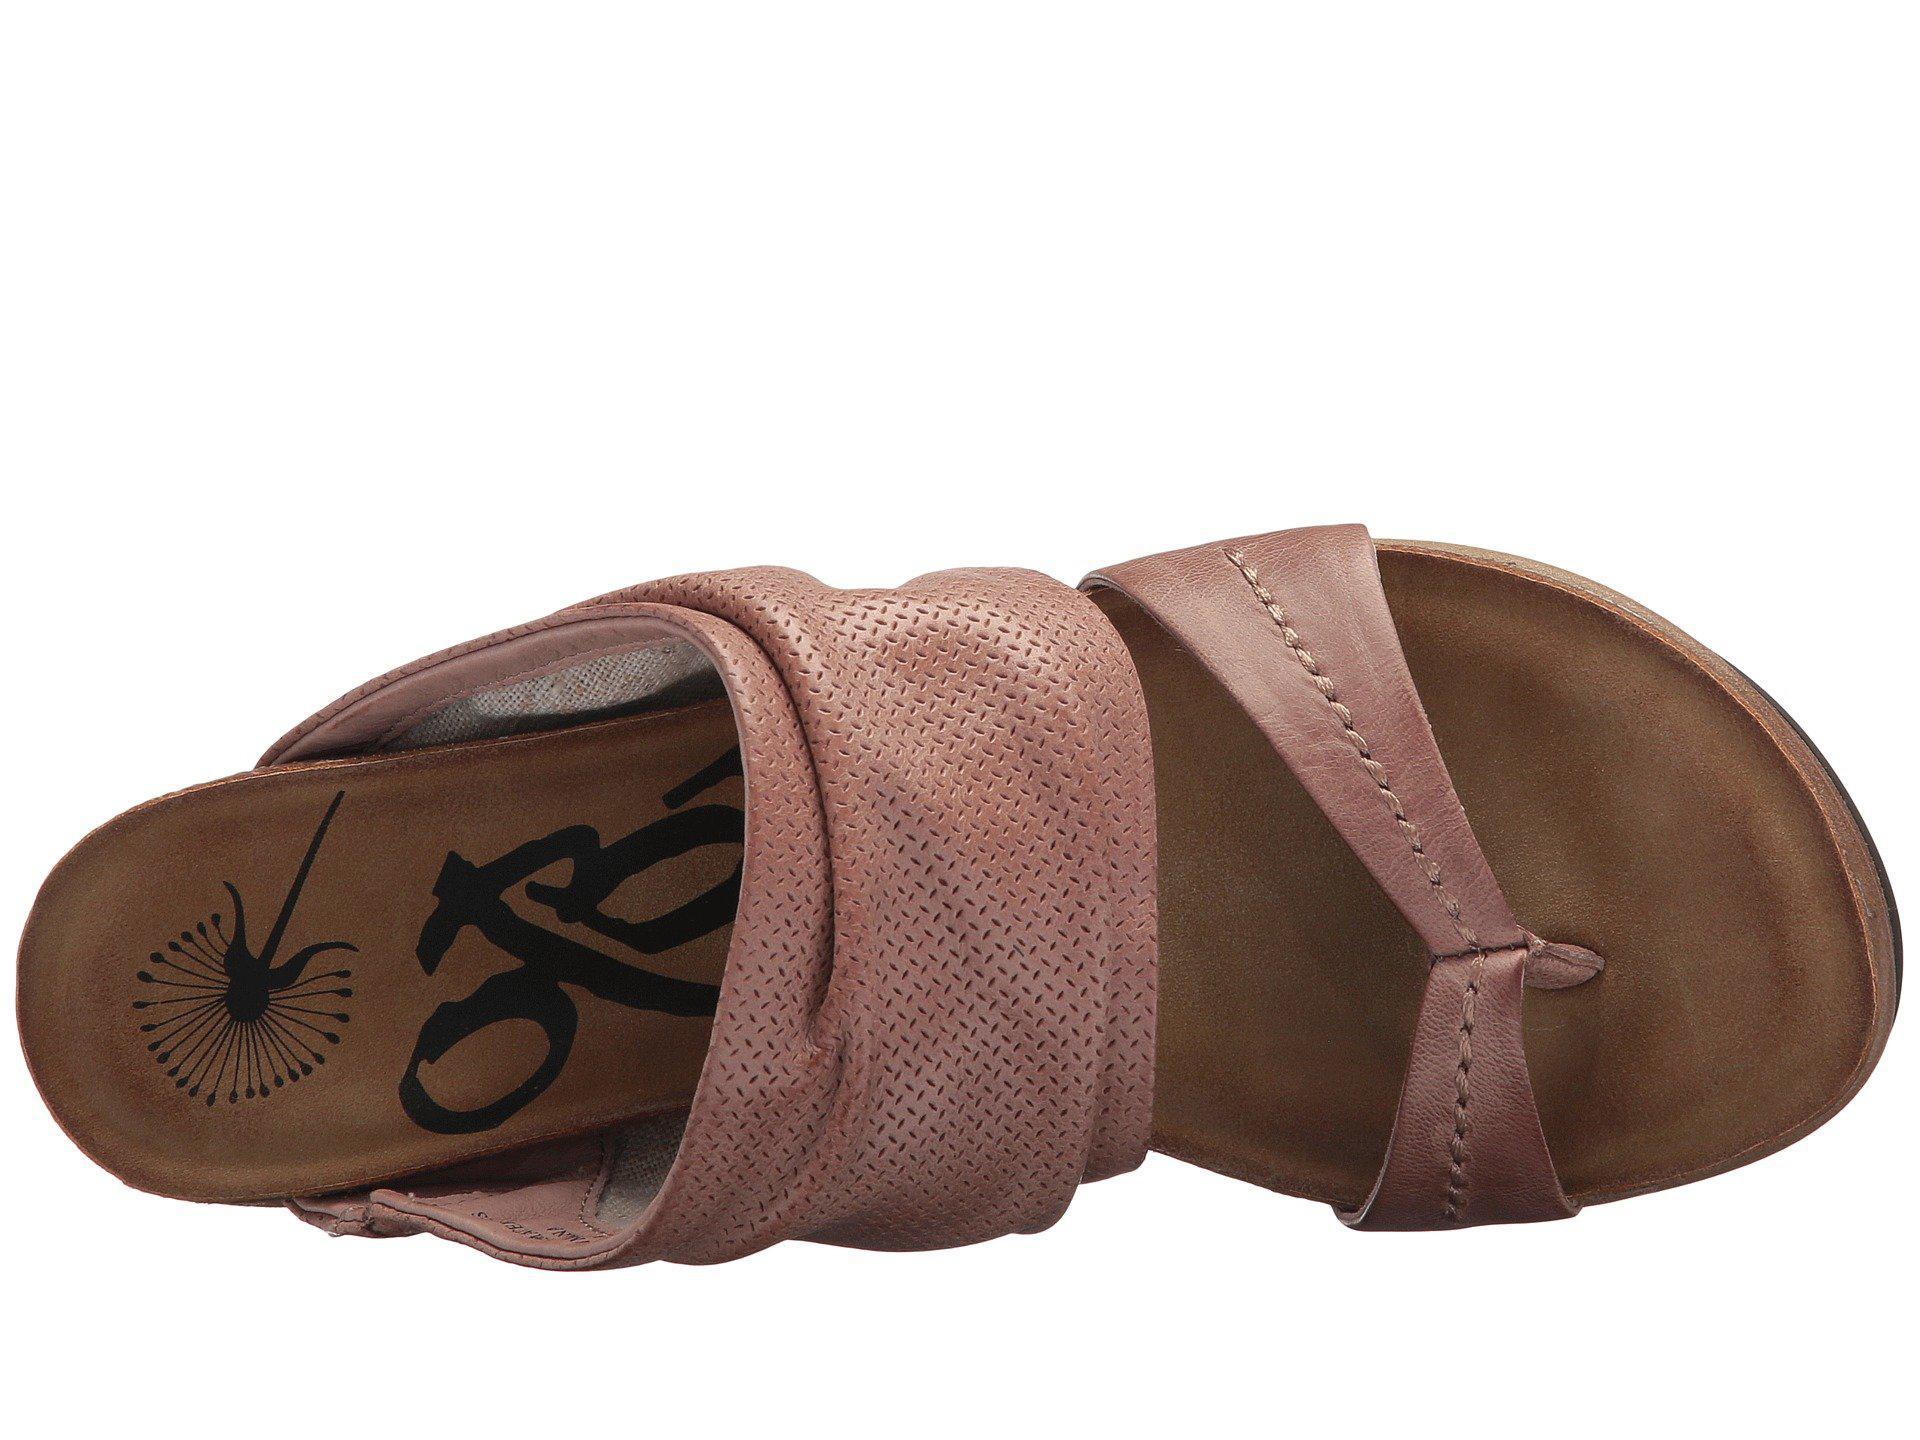 097768aa03dc Otbt - Brown Tailgate (warm Pink) Women s Sandals - Lyst. View fullscreen